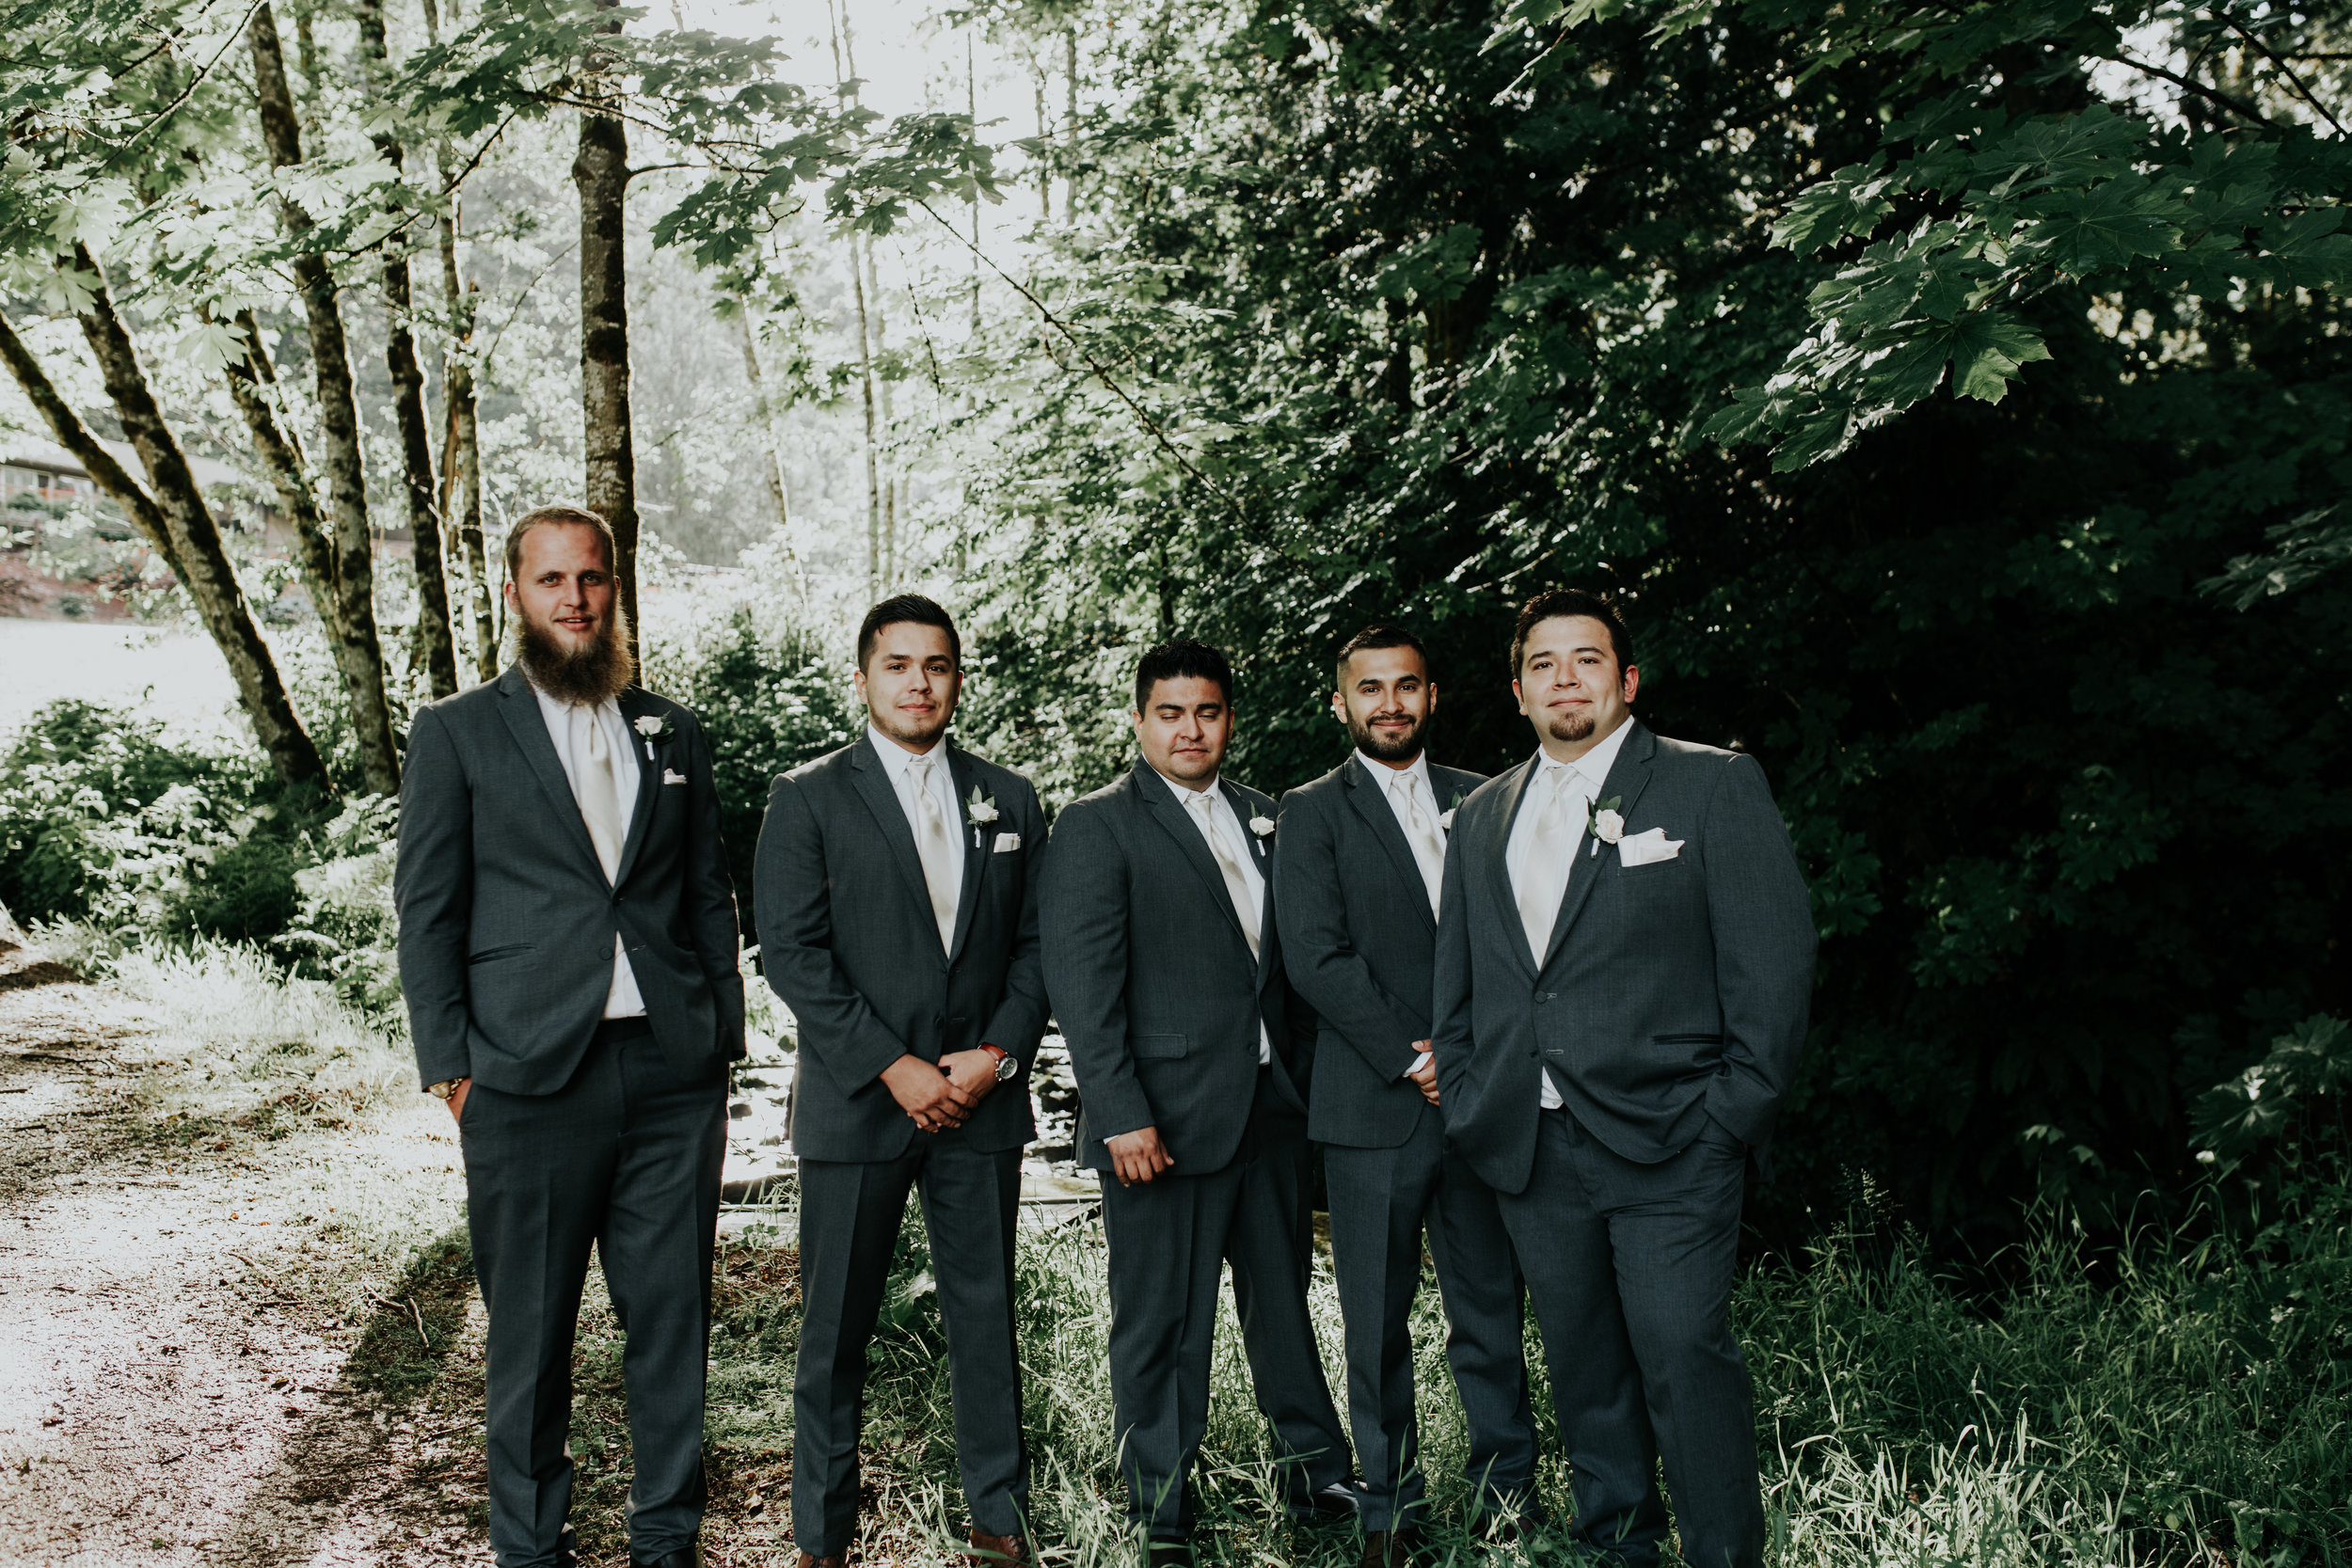 ramirez-wedding-portland-jamiecarle-6738.jpg